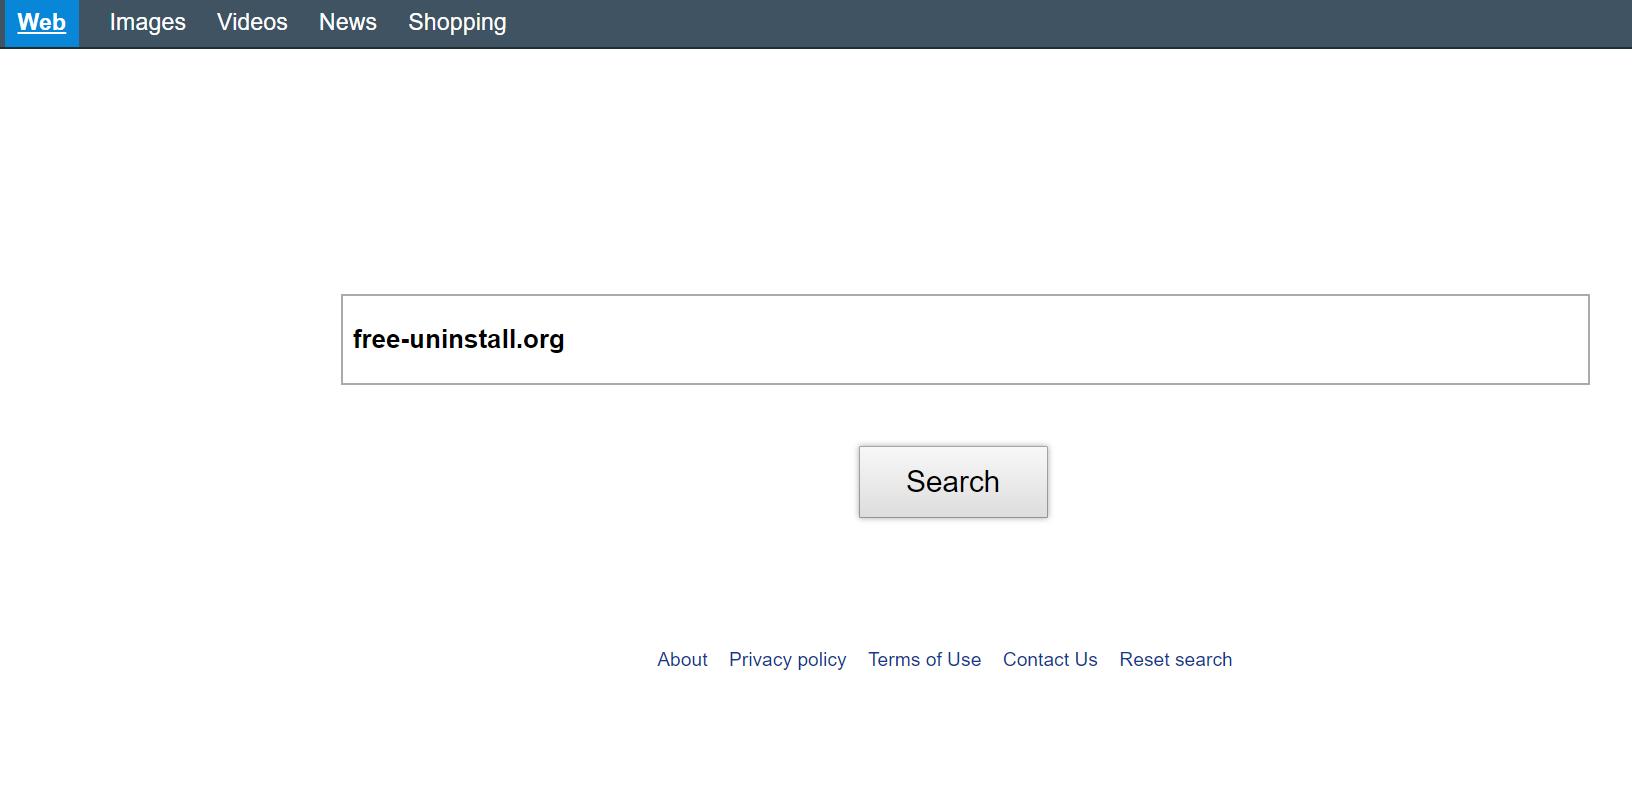 Search.froktiser.com Hijacker